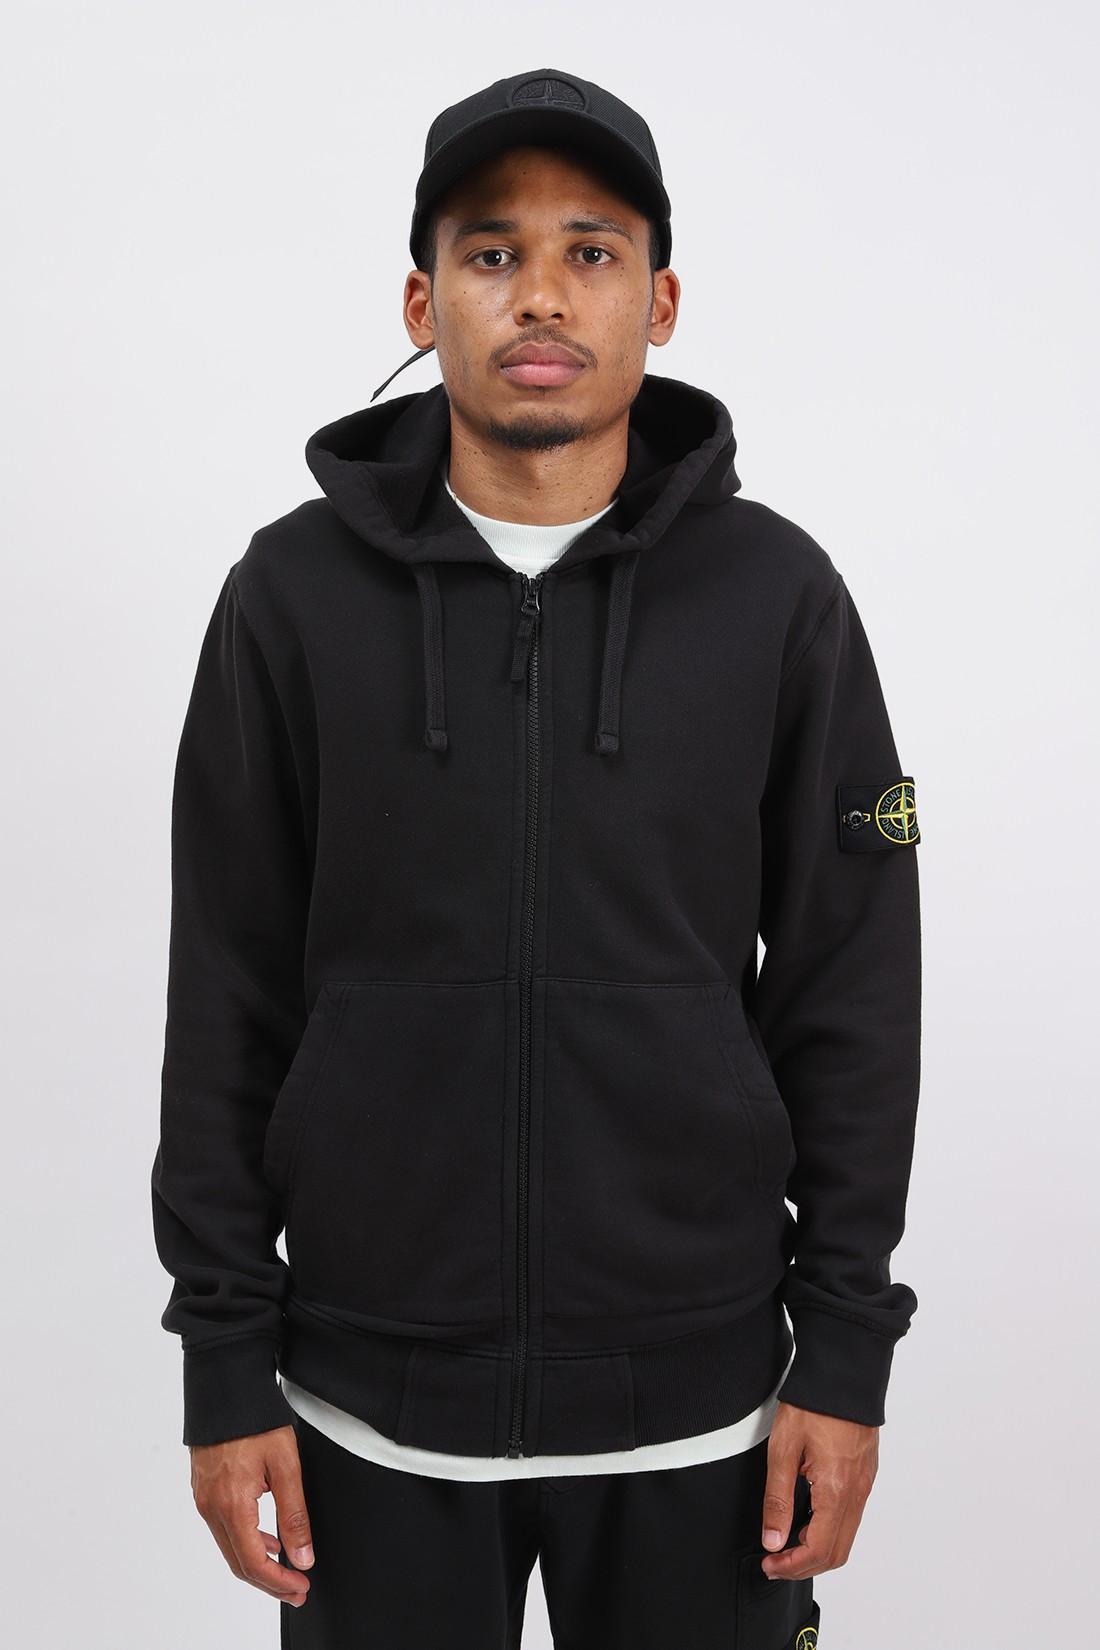 STONE ISLAND / 64220 hooded zip sweater v0029 Nero